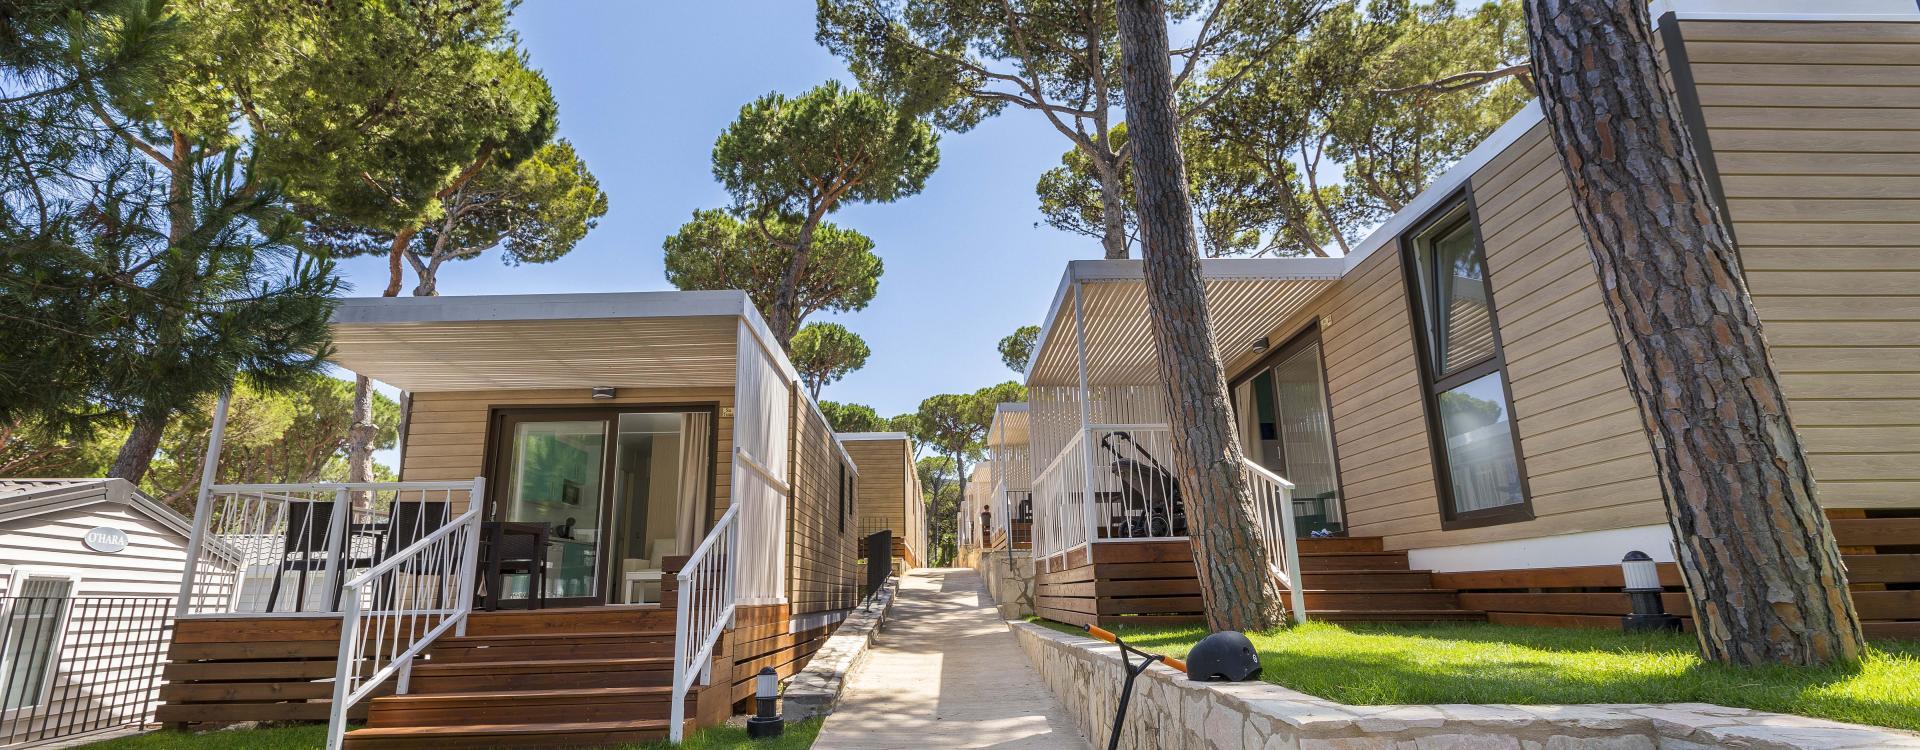 Bungalow Sa Tuna Camping & Bungalows Interpals (Spanje)